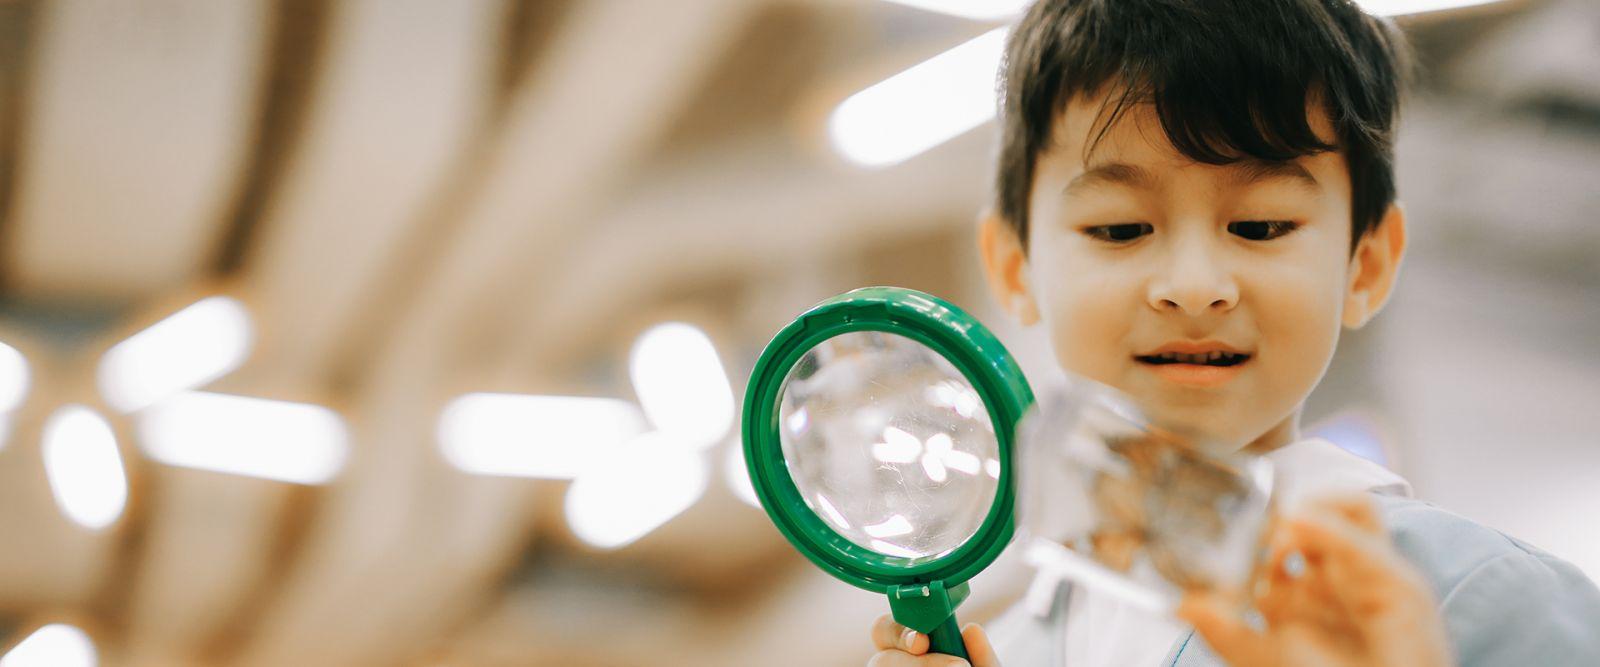 Experience Learning | Victoria Kindergarten, Nursery , Infant & Toddler Programme